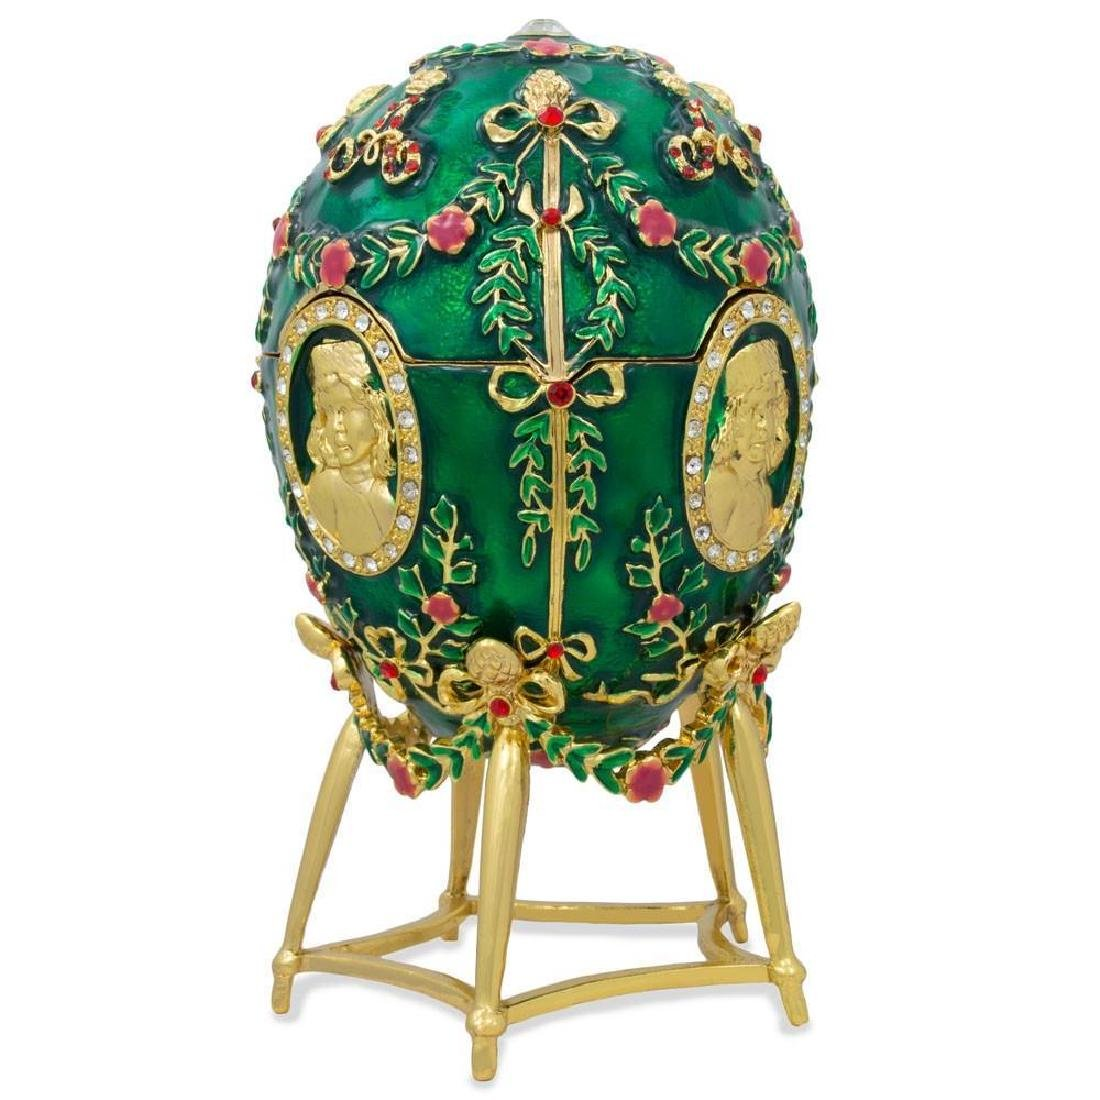 Faberge Inspired 1908 Alexander Palace Faberge Egg - 4